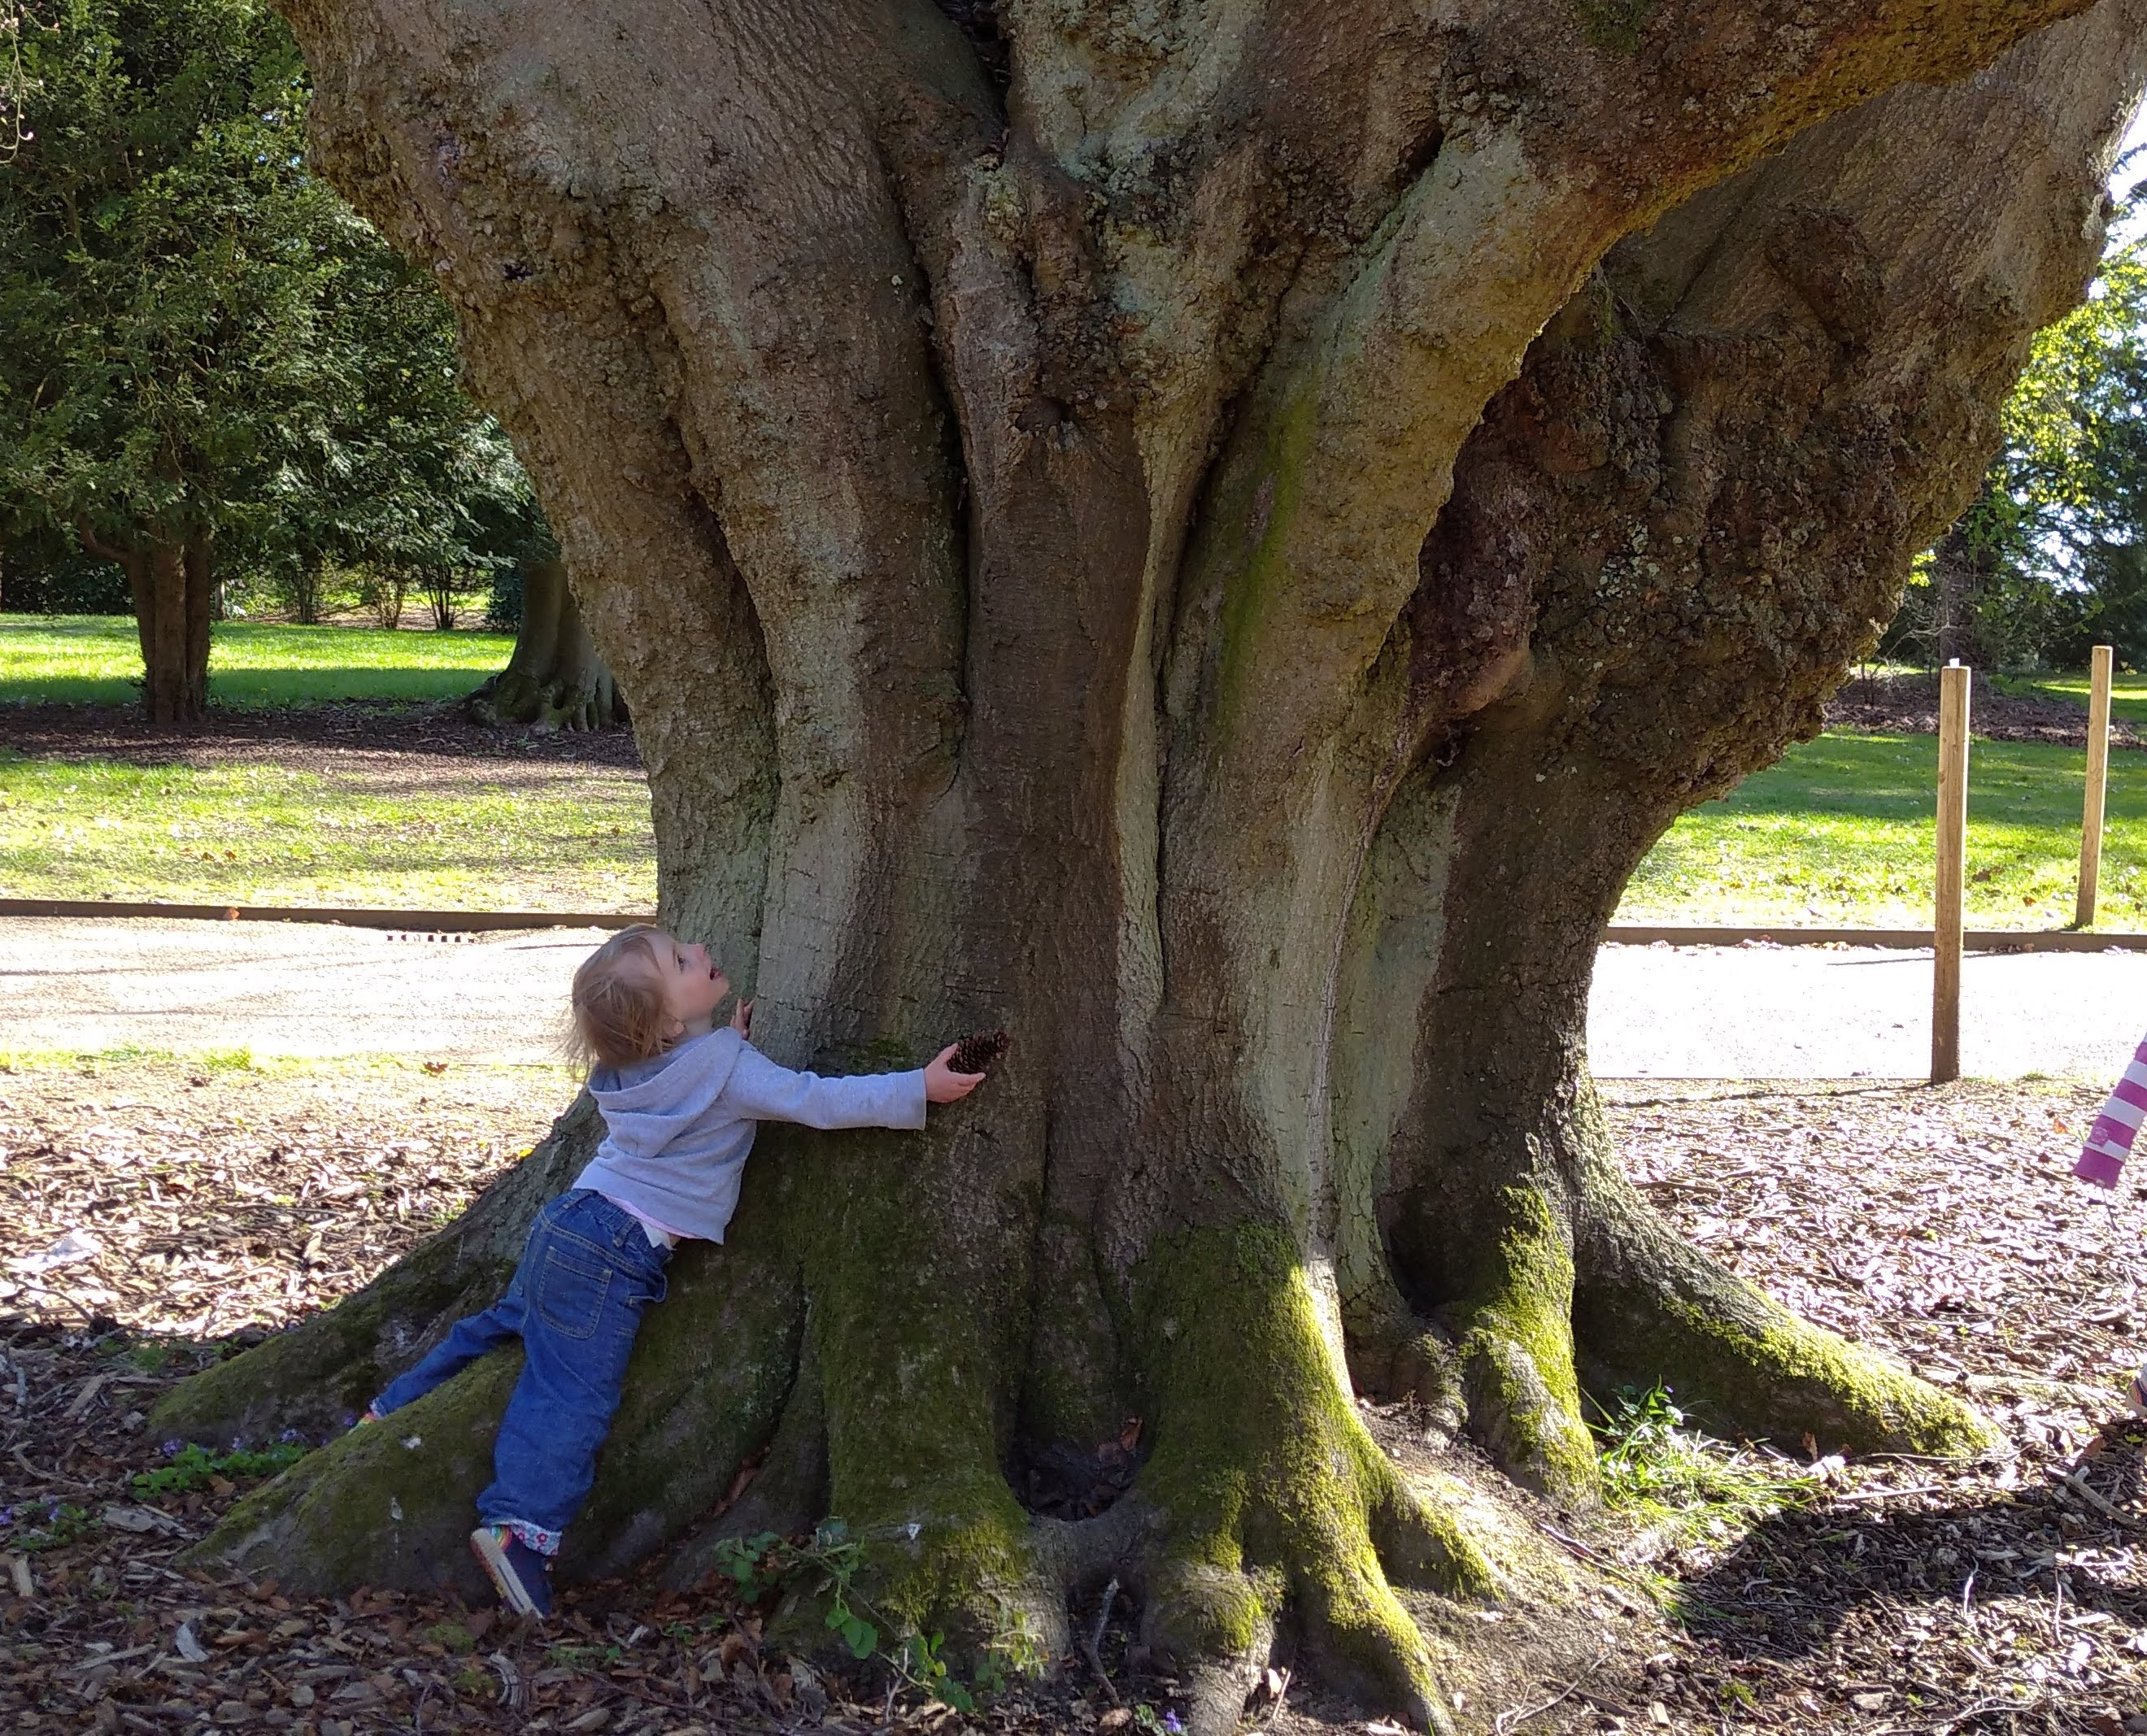 Toddler hugging an ancient beech tree